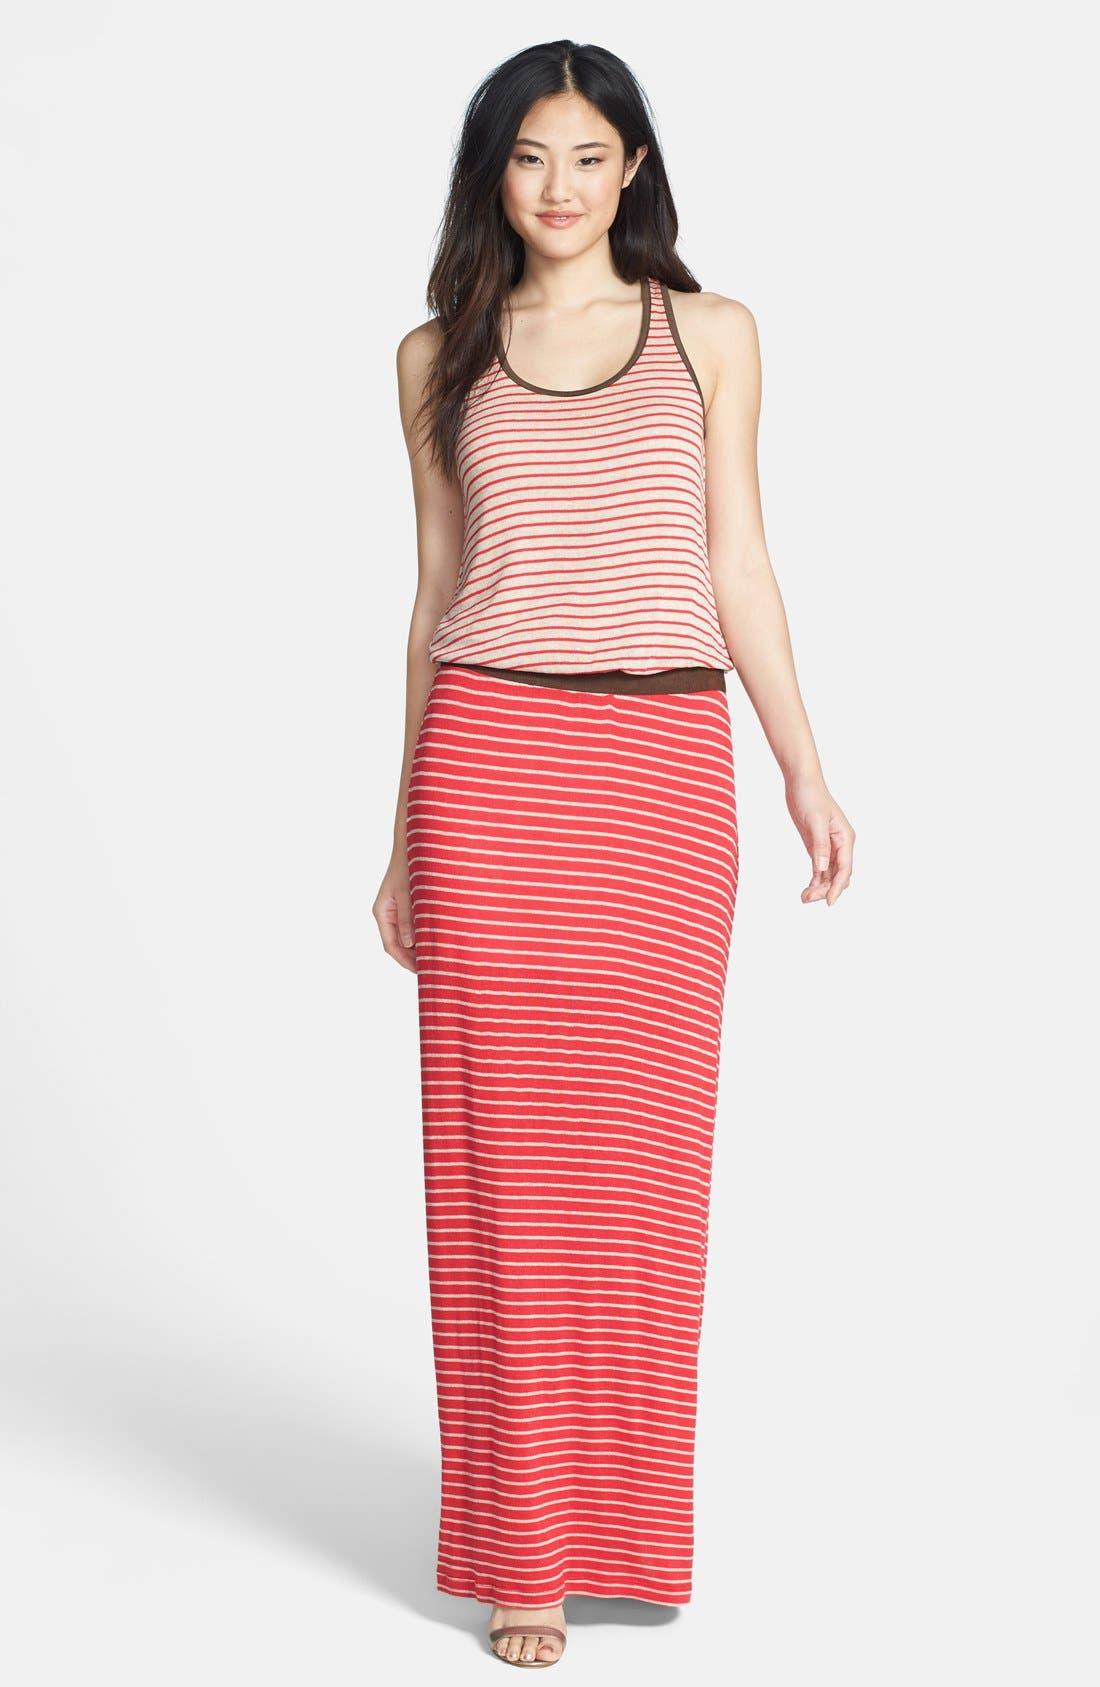 Alternate Image 1 Selected - Tart 'Maris' Faux Suede Trim Stripe Maxi Dress